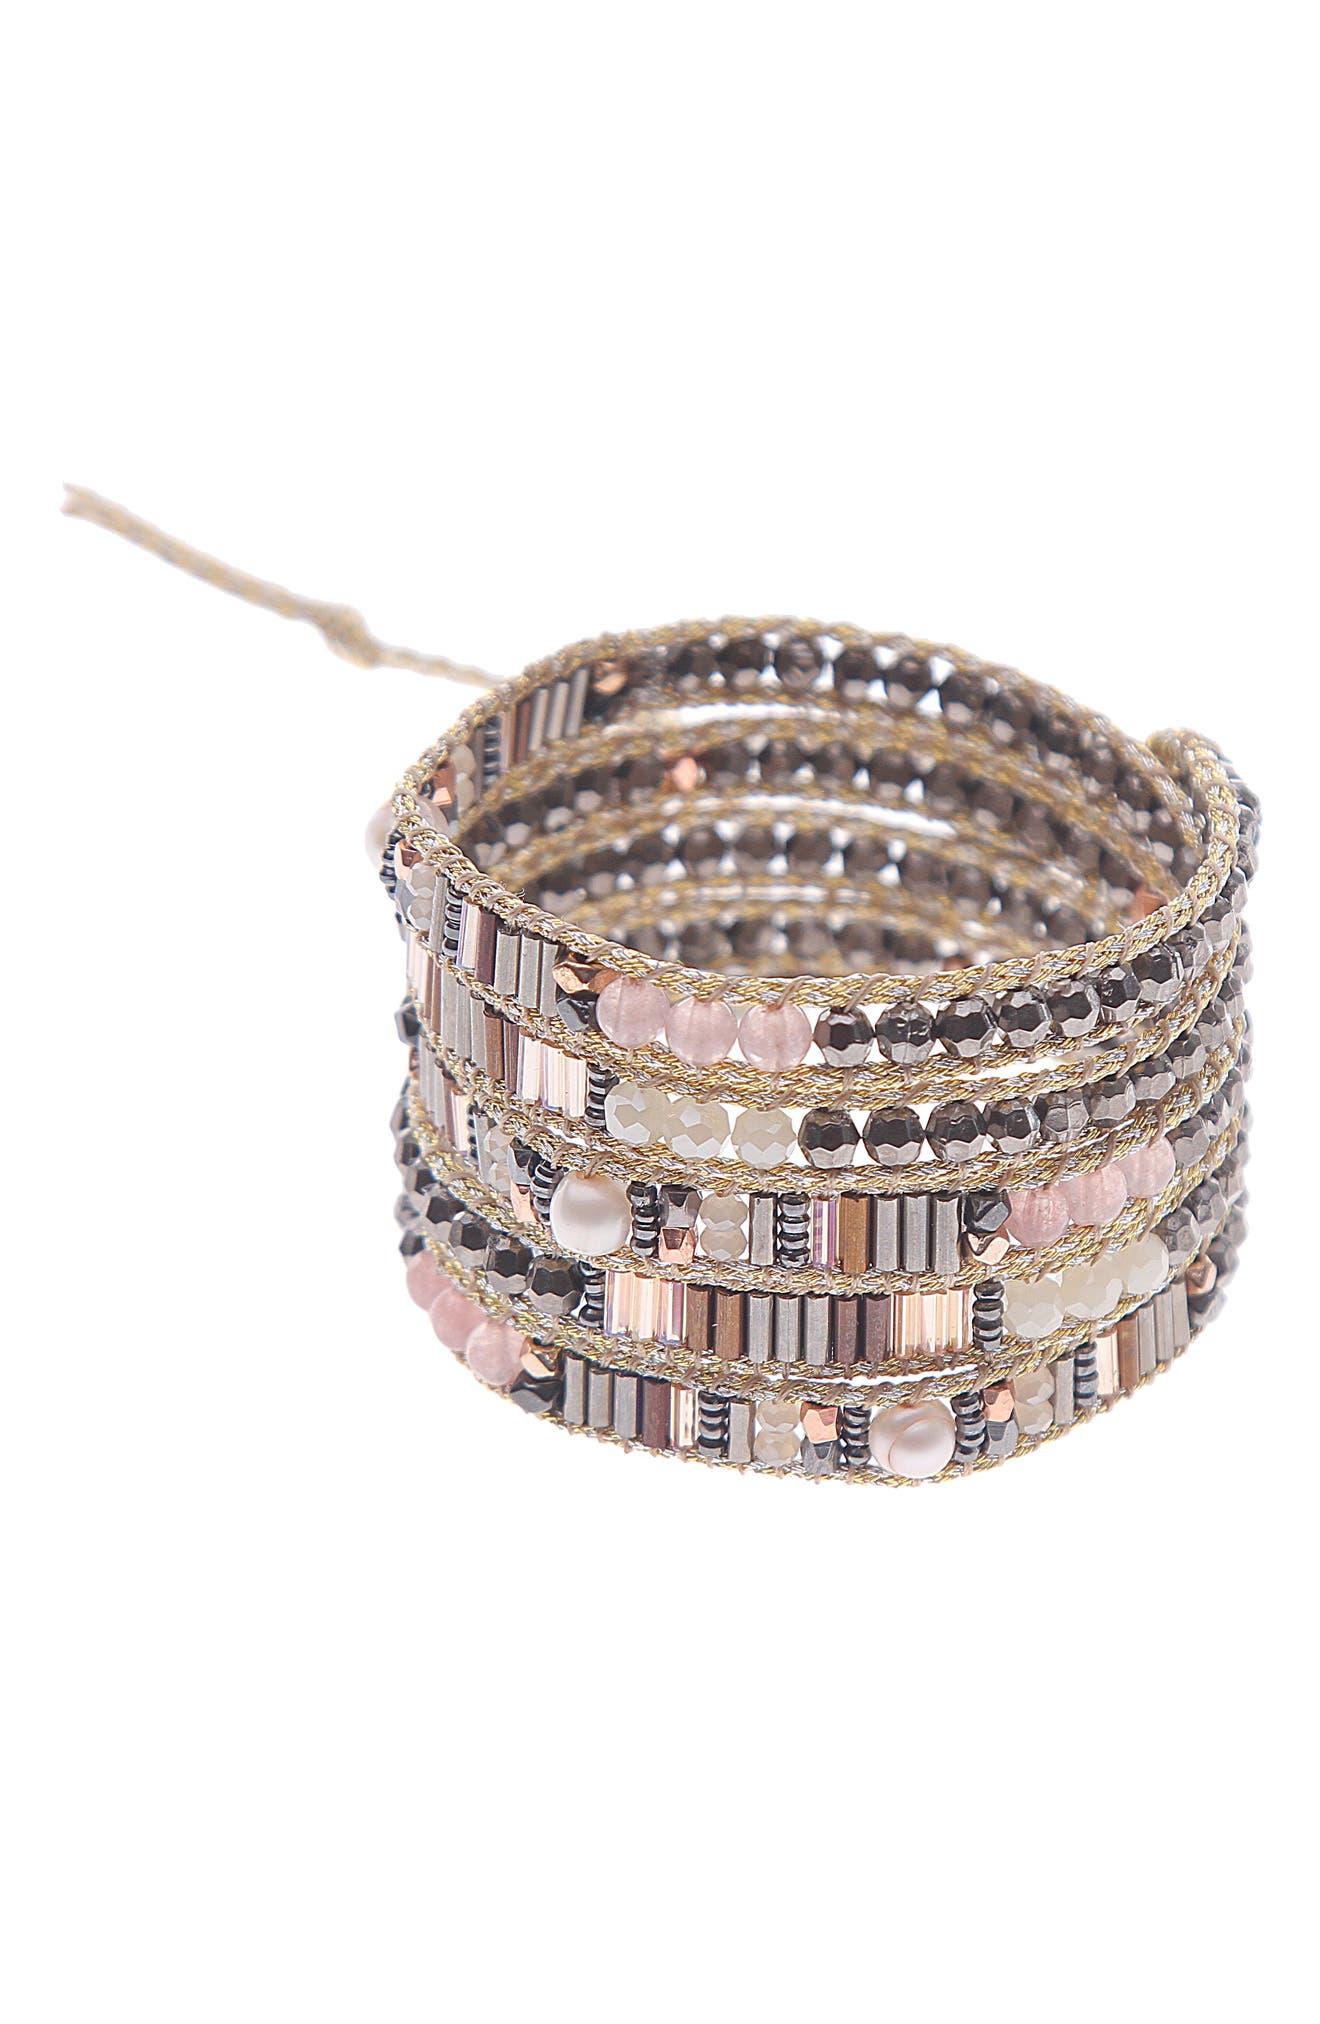 Crystal Beaded Wrap Bracelet,                         Main,                         color, Gunmetal/ Creme